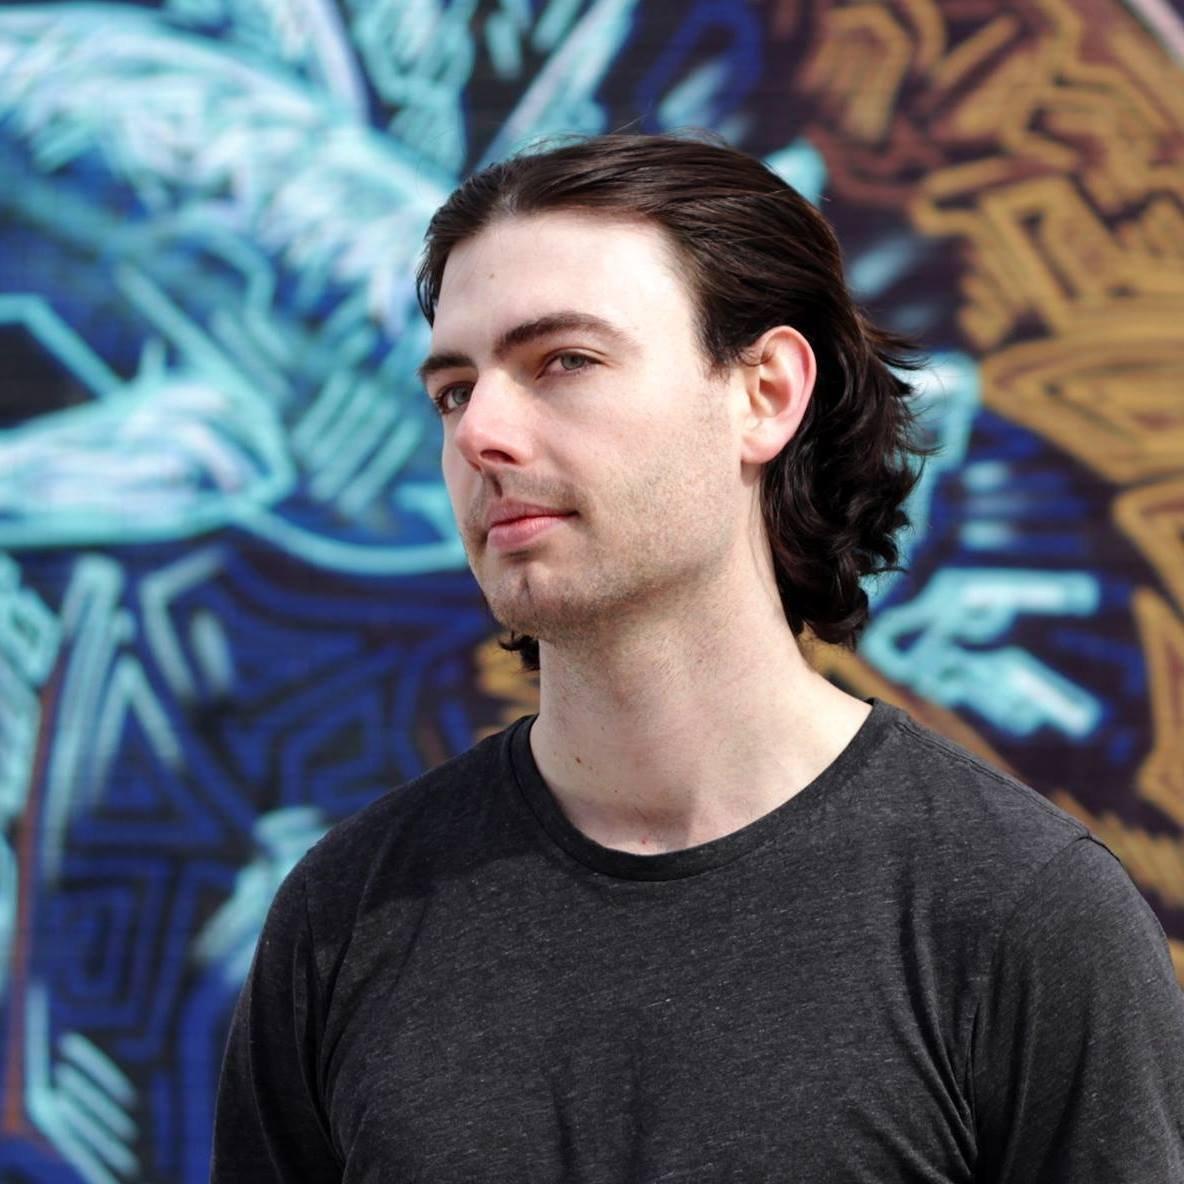 Waxman profile picture